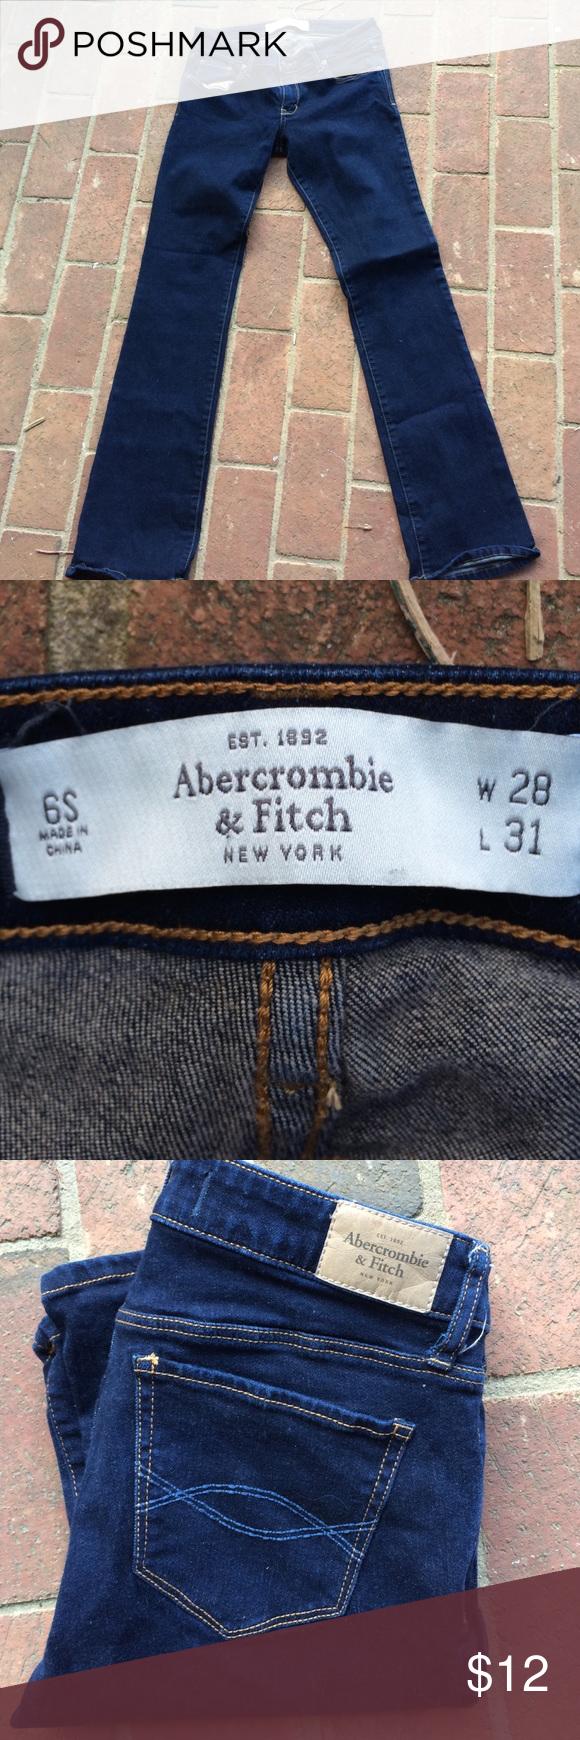 Abercrombie & Fitch Jeans 6S/28 Abercrombie & Fitch Jeans 6S.  Weight 28, Length 31 Abercrombie & Fitch Jeans Skinny